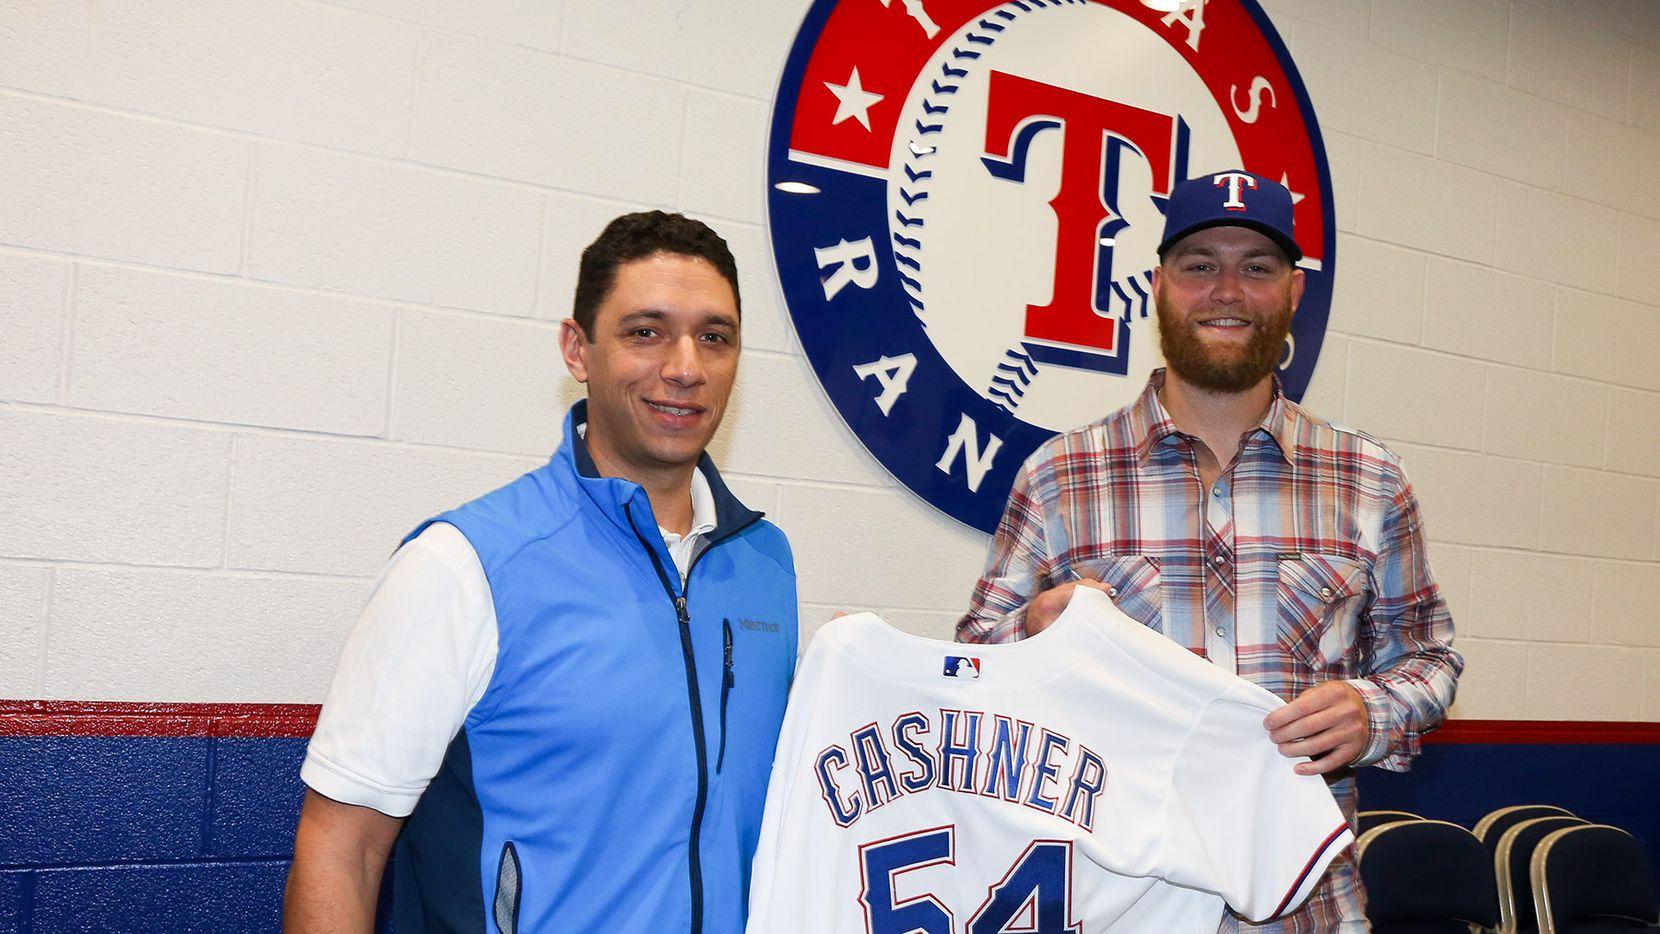 Arlington, TX - The Texas Rangers announce signing of RHP Andrew Cashner at Globe Life Park in Arlington on November 21, 2016.  (Photo by Kelly Gavin/Texas Rangers)